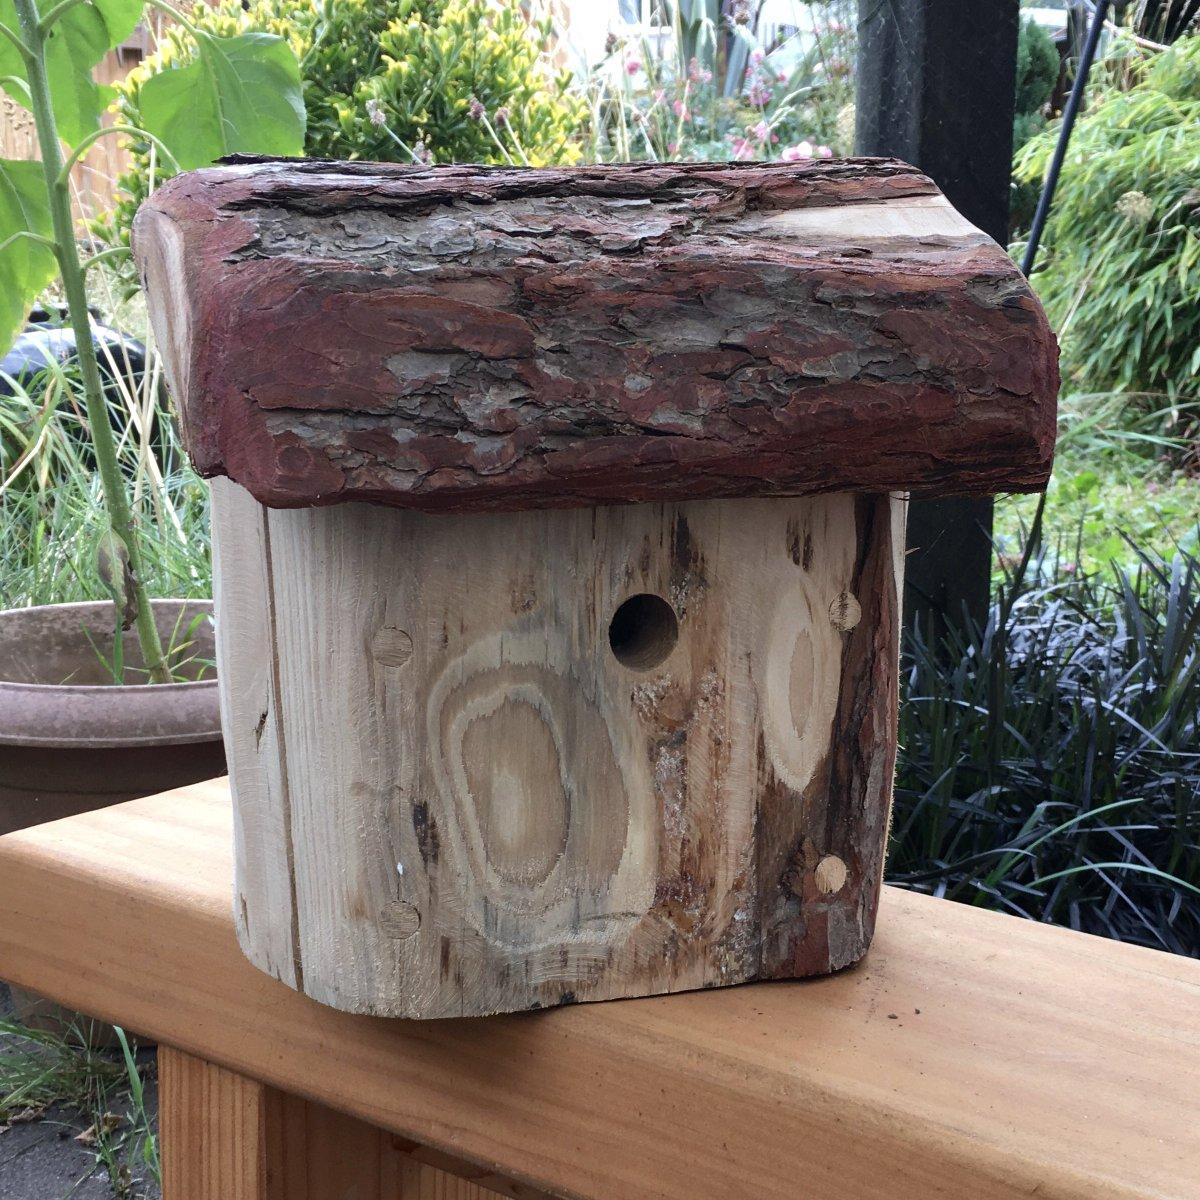 Lewis on twitter this bird house was handmade from recycled lewis on twitter this bird house was handmade from recycled larch etsy httpst1tb2c7fw5s midlandshour handmadehour organichour shropshire sciox Image collections